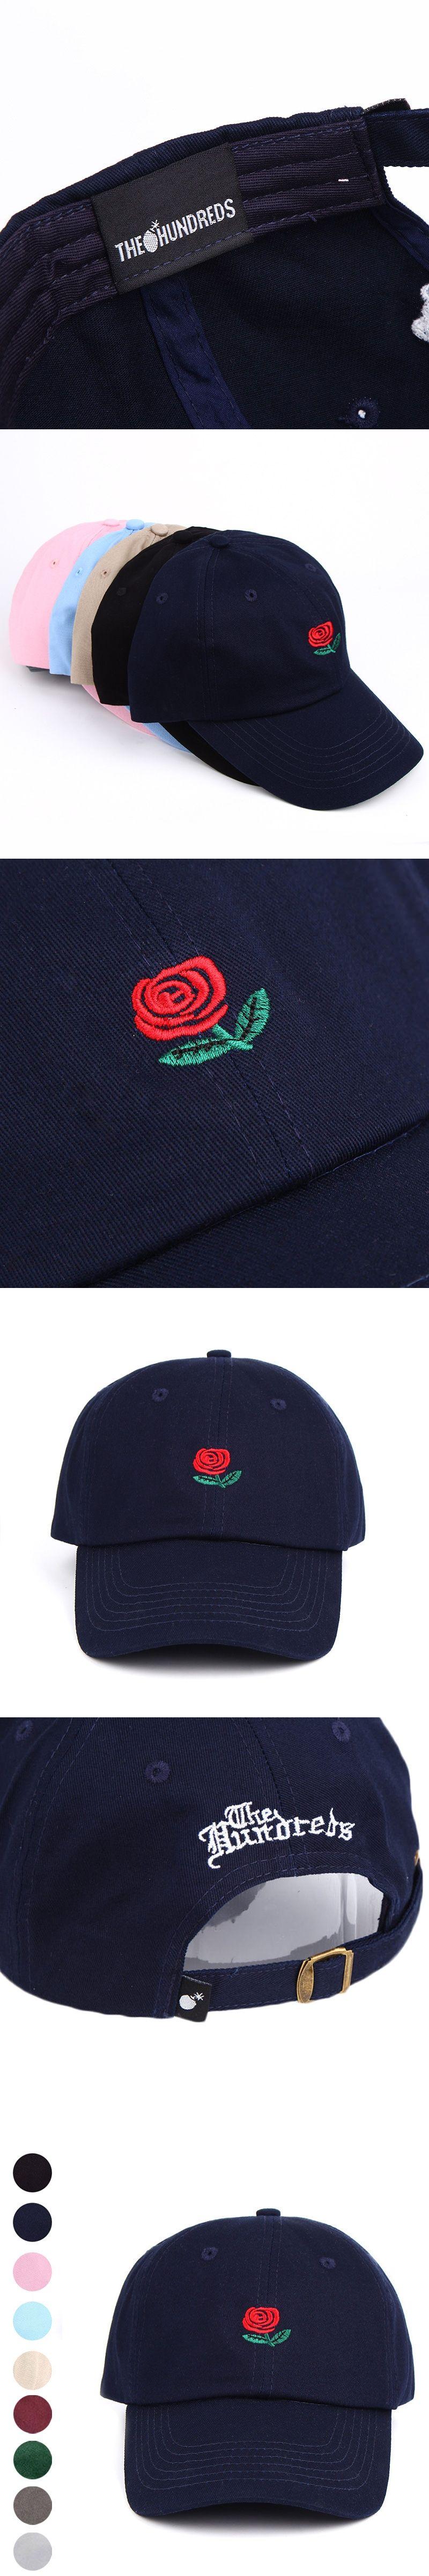 eaf31889046 Fashion Korean Summer Women Men Hat Rose Flower Embroidery Peaked Cap  Curved Baseball Caps Casual Hip